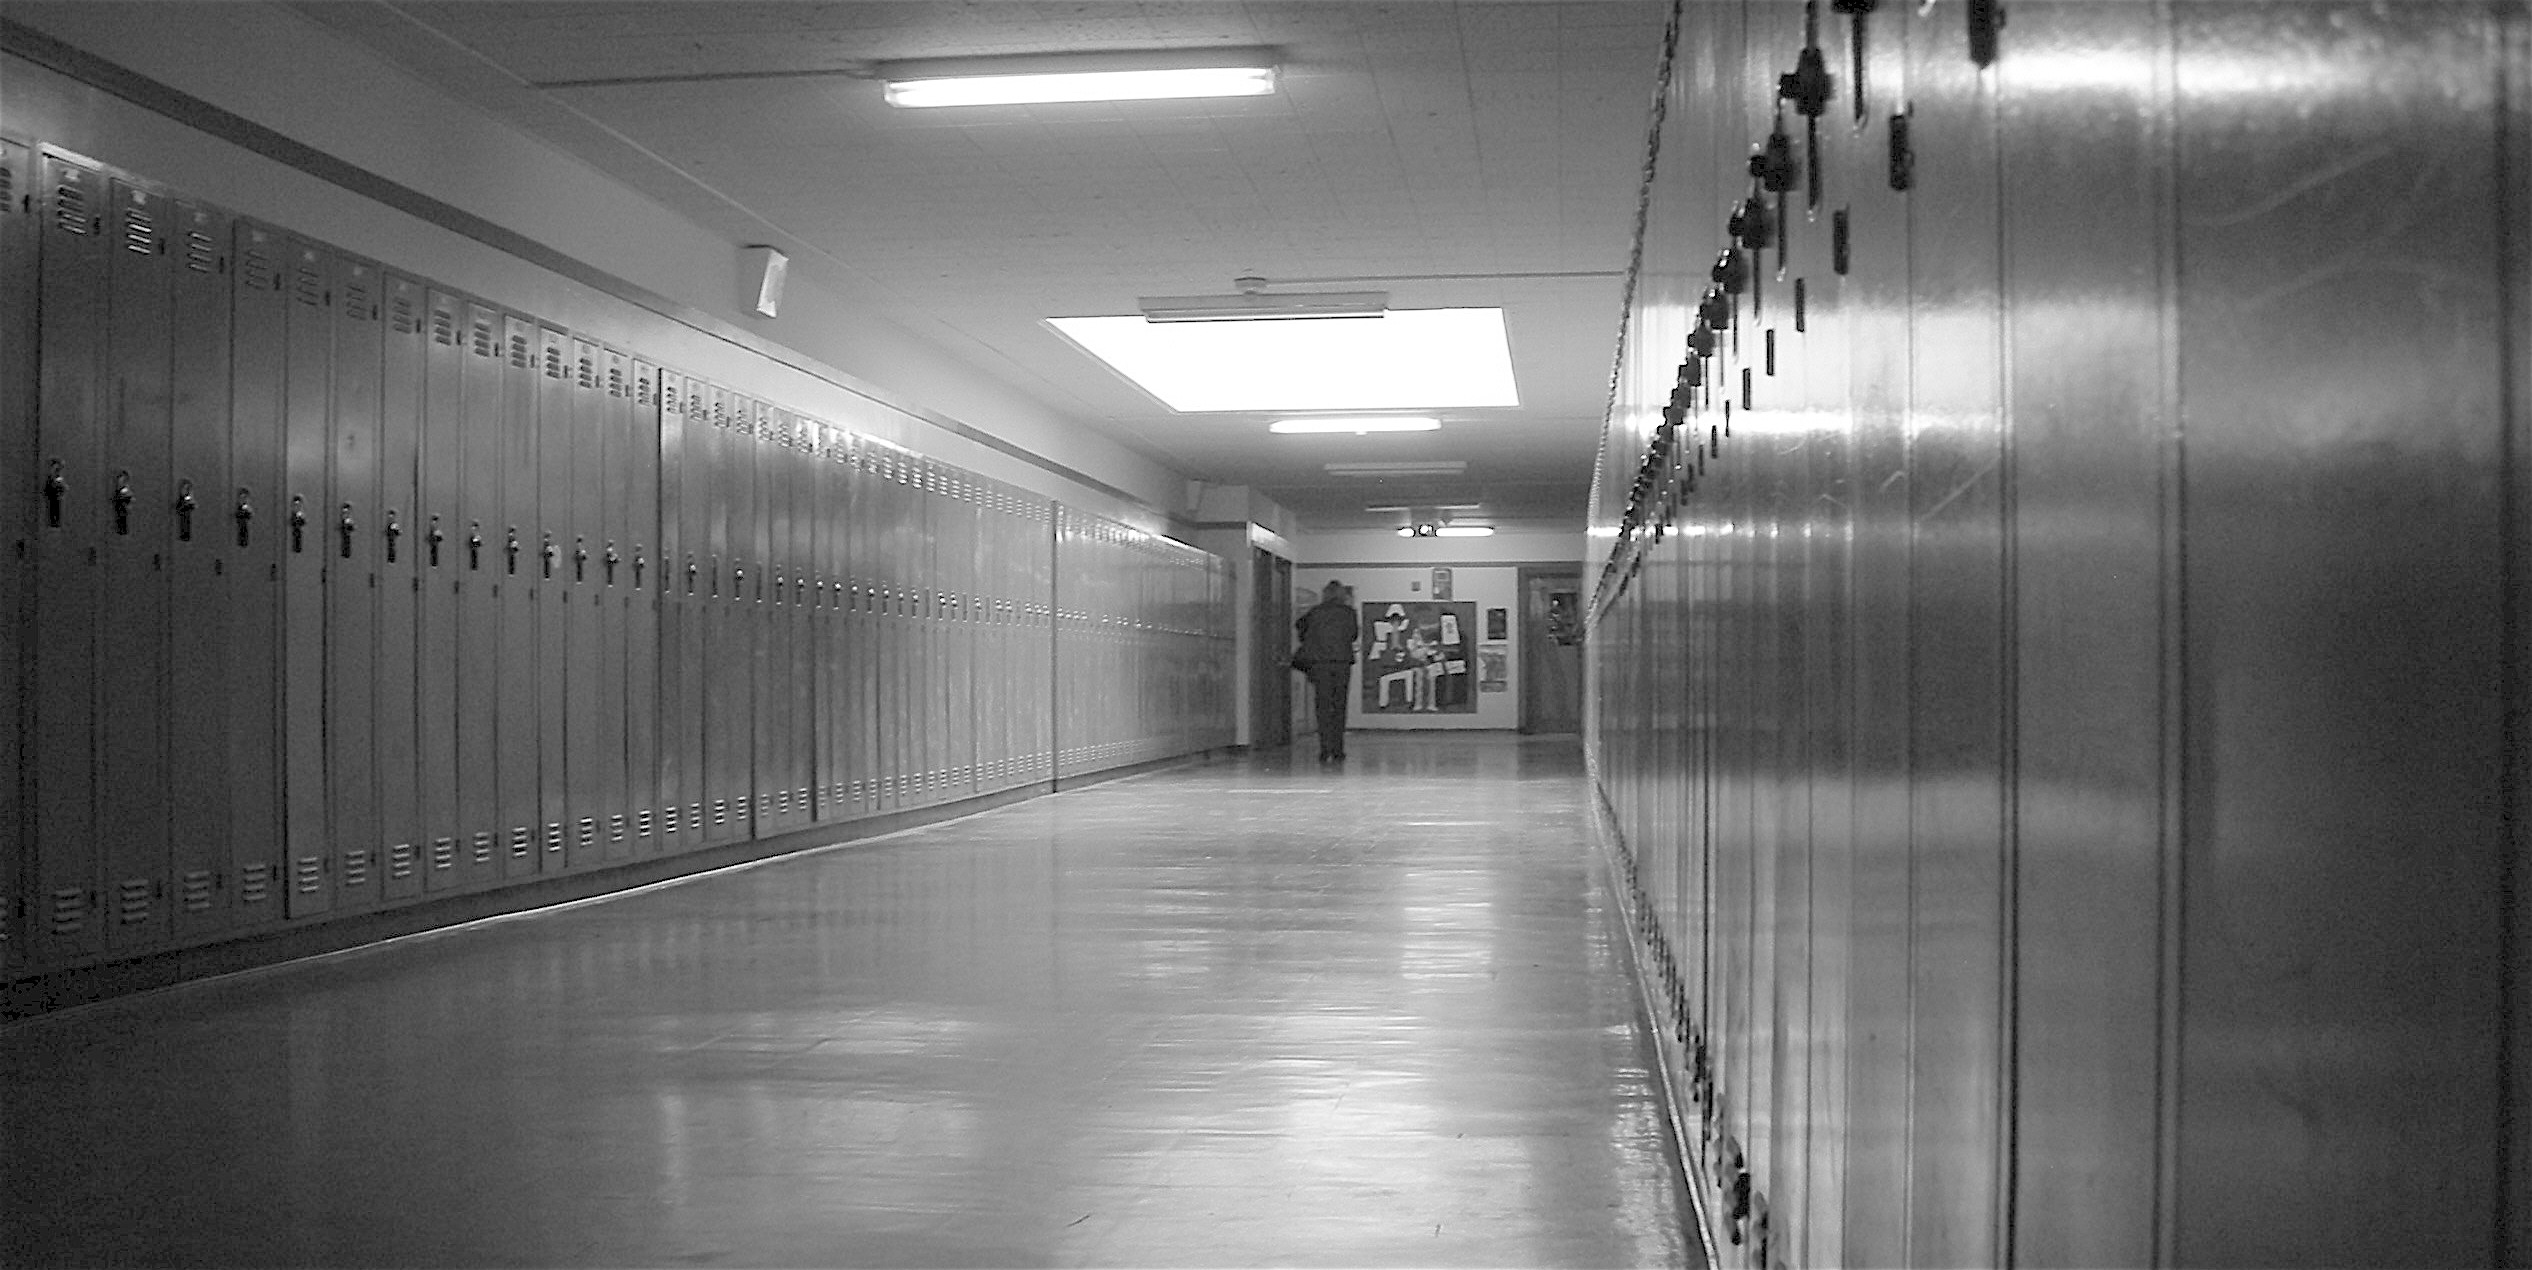 Eckstein_Middle_School_hallway_02A